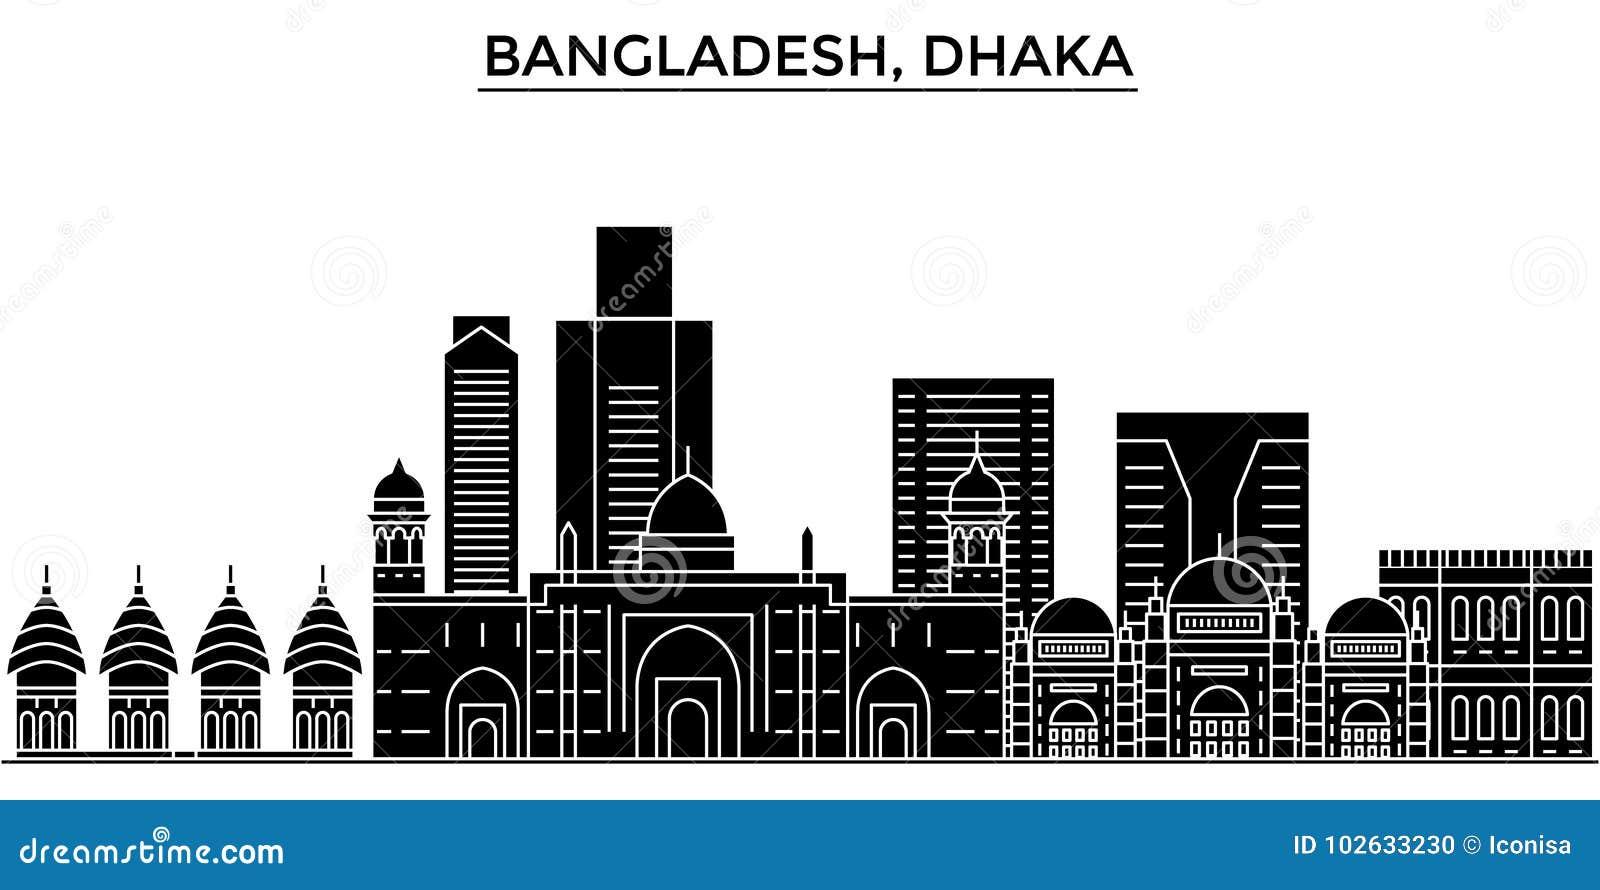 Dhaka City Skyline Black And White Silhouette Cartoon